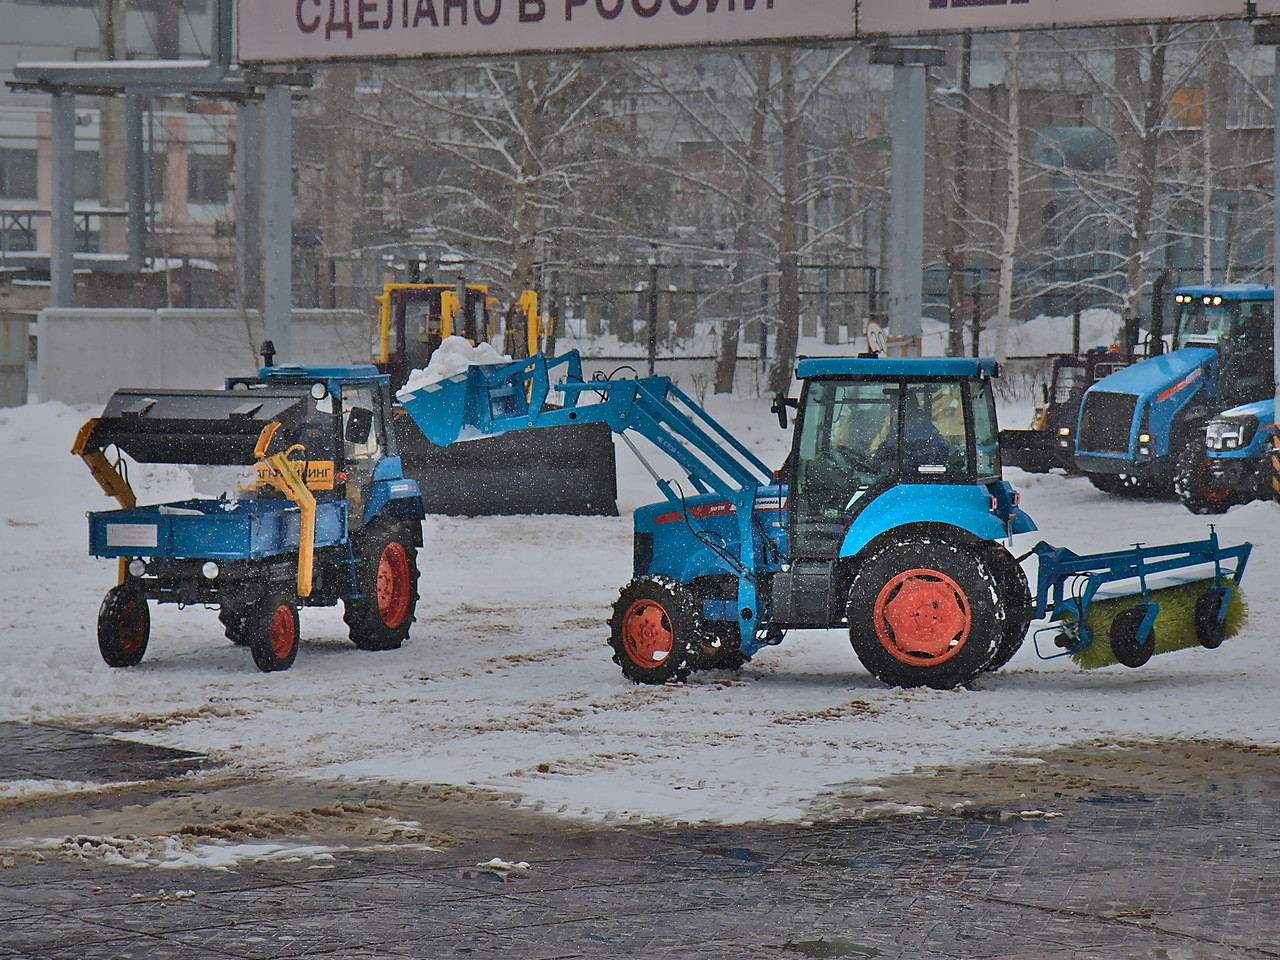 Мини-трактор Агромаш 30ТК: продажа, цена в Казани.